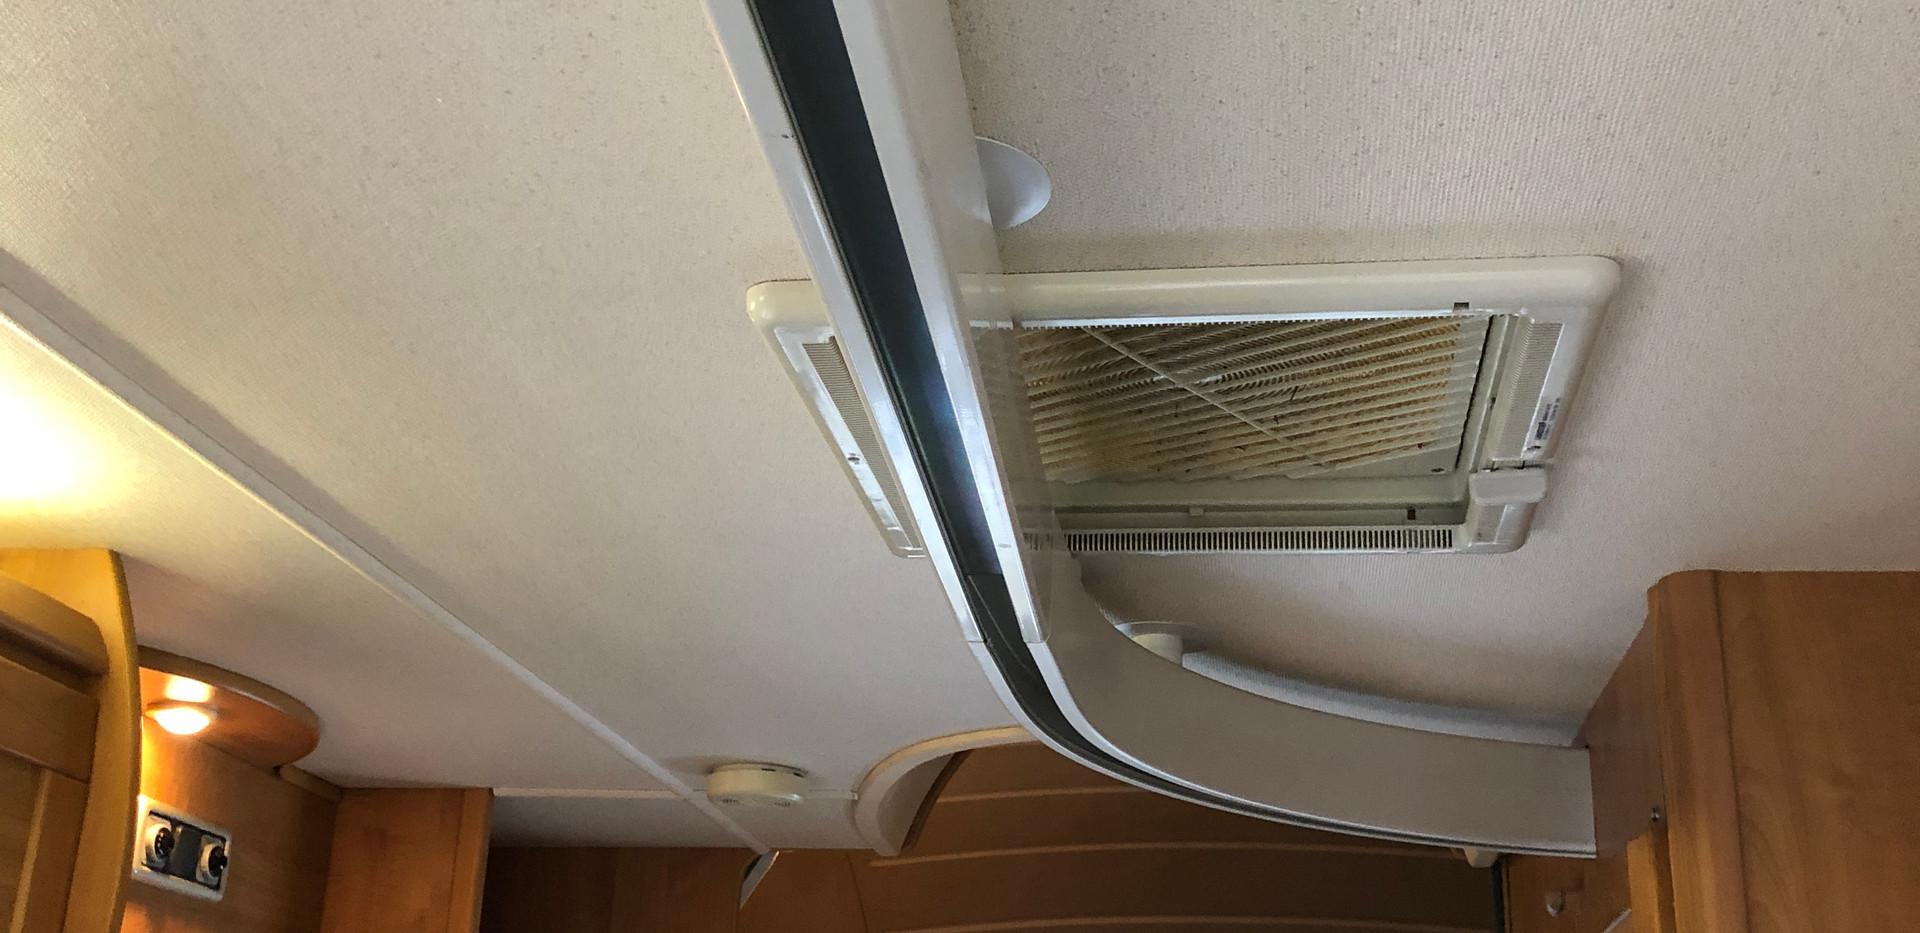 2003 Autotrail Cheyenne 634SE I Wheelchair accessible motorhome I Coachbuilt I United Kingdom